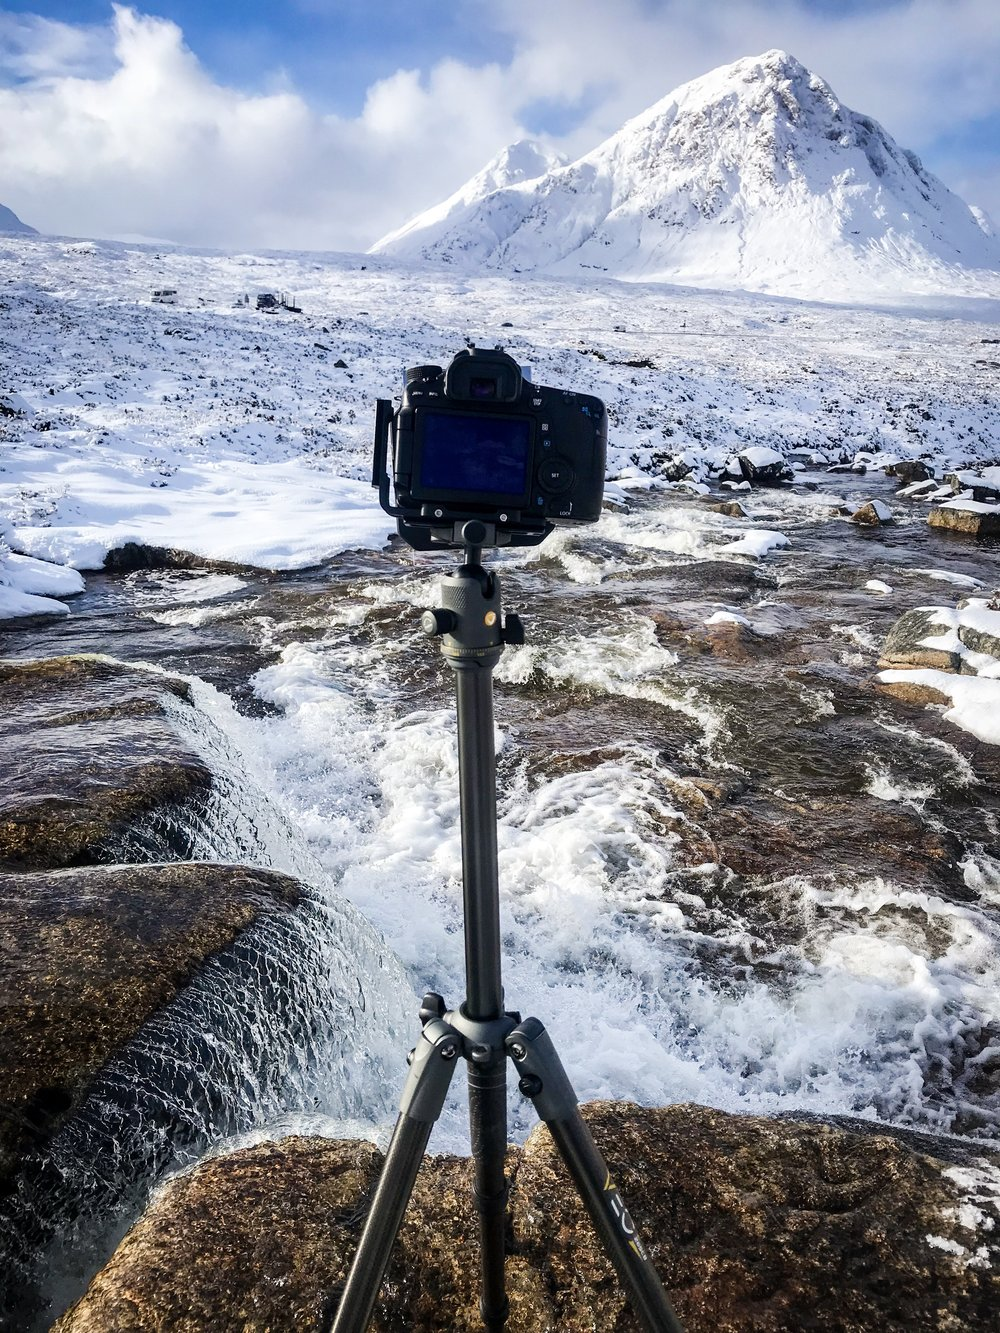 The Vanguard Veo 2 265cb Brennan Painter Photography Carbon Fiber Tripod Image Shot Using At Malin Head Co Donegal